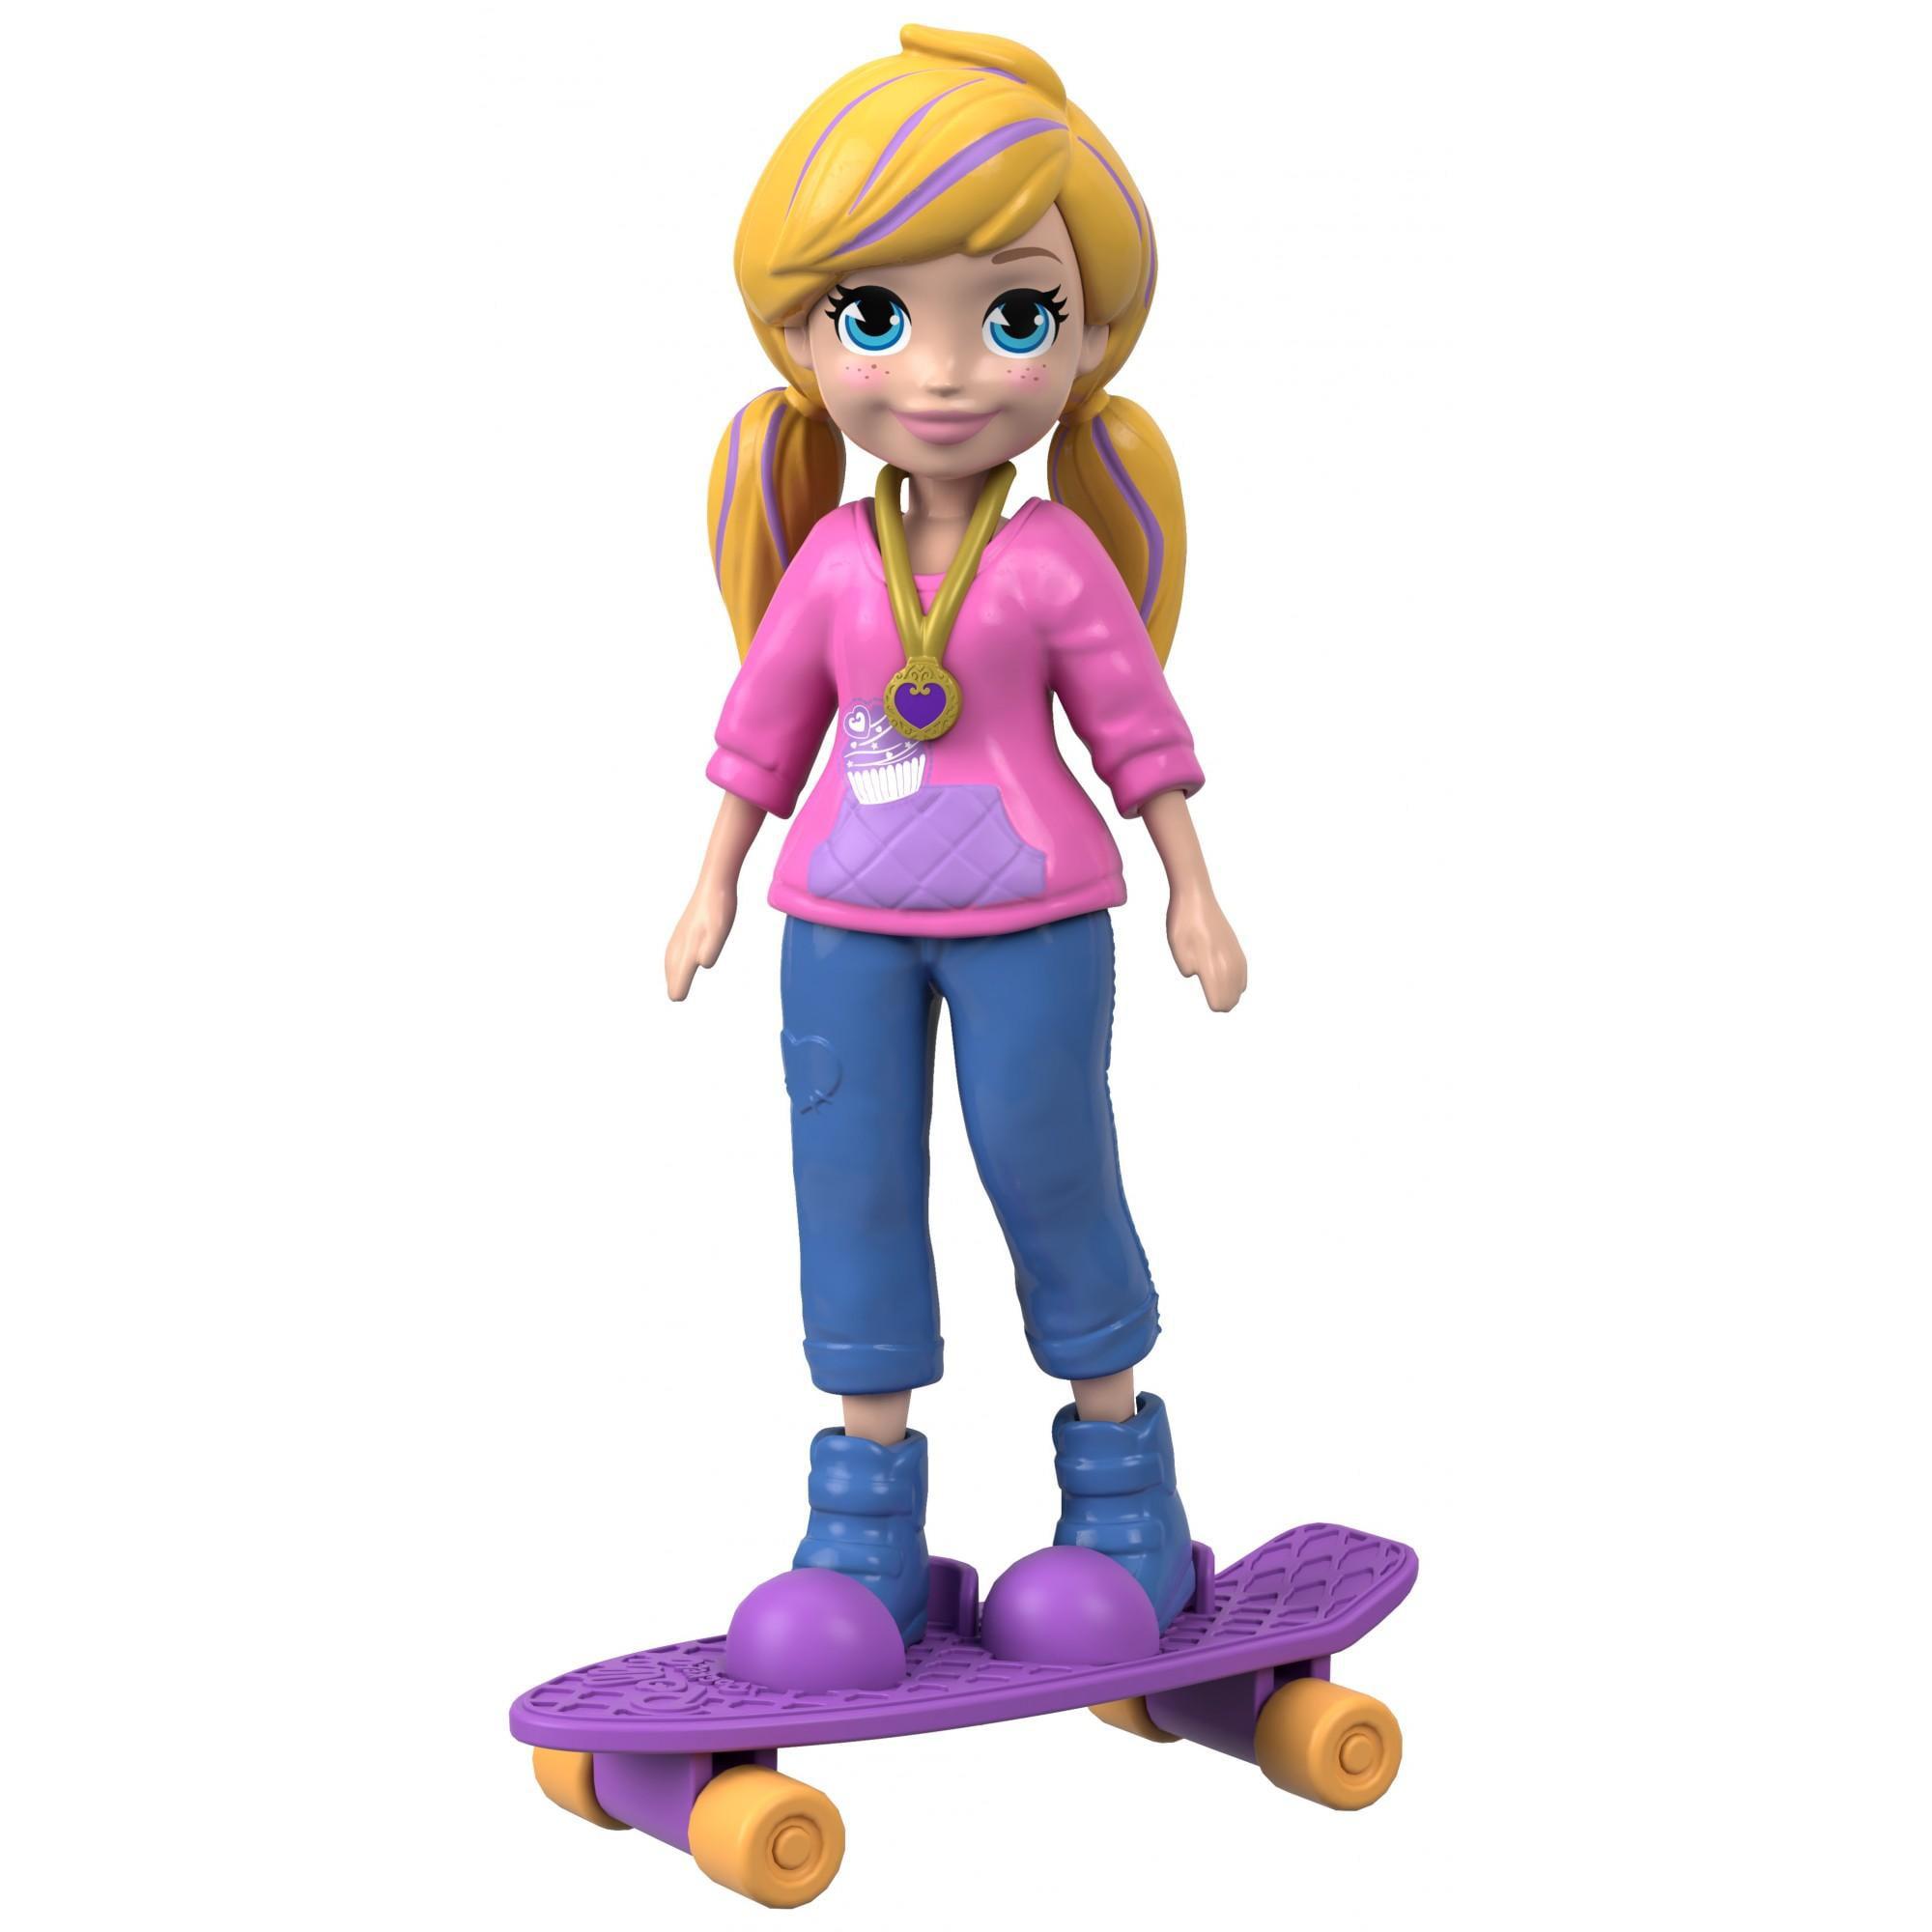 Polly Pocket Active Pose Skate Rockin' Adventure Polly Doll with Skateboard